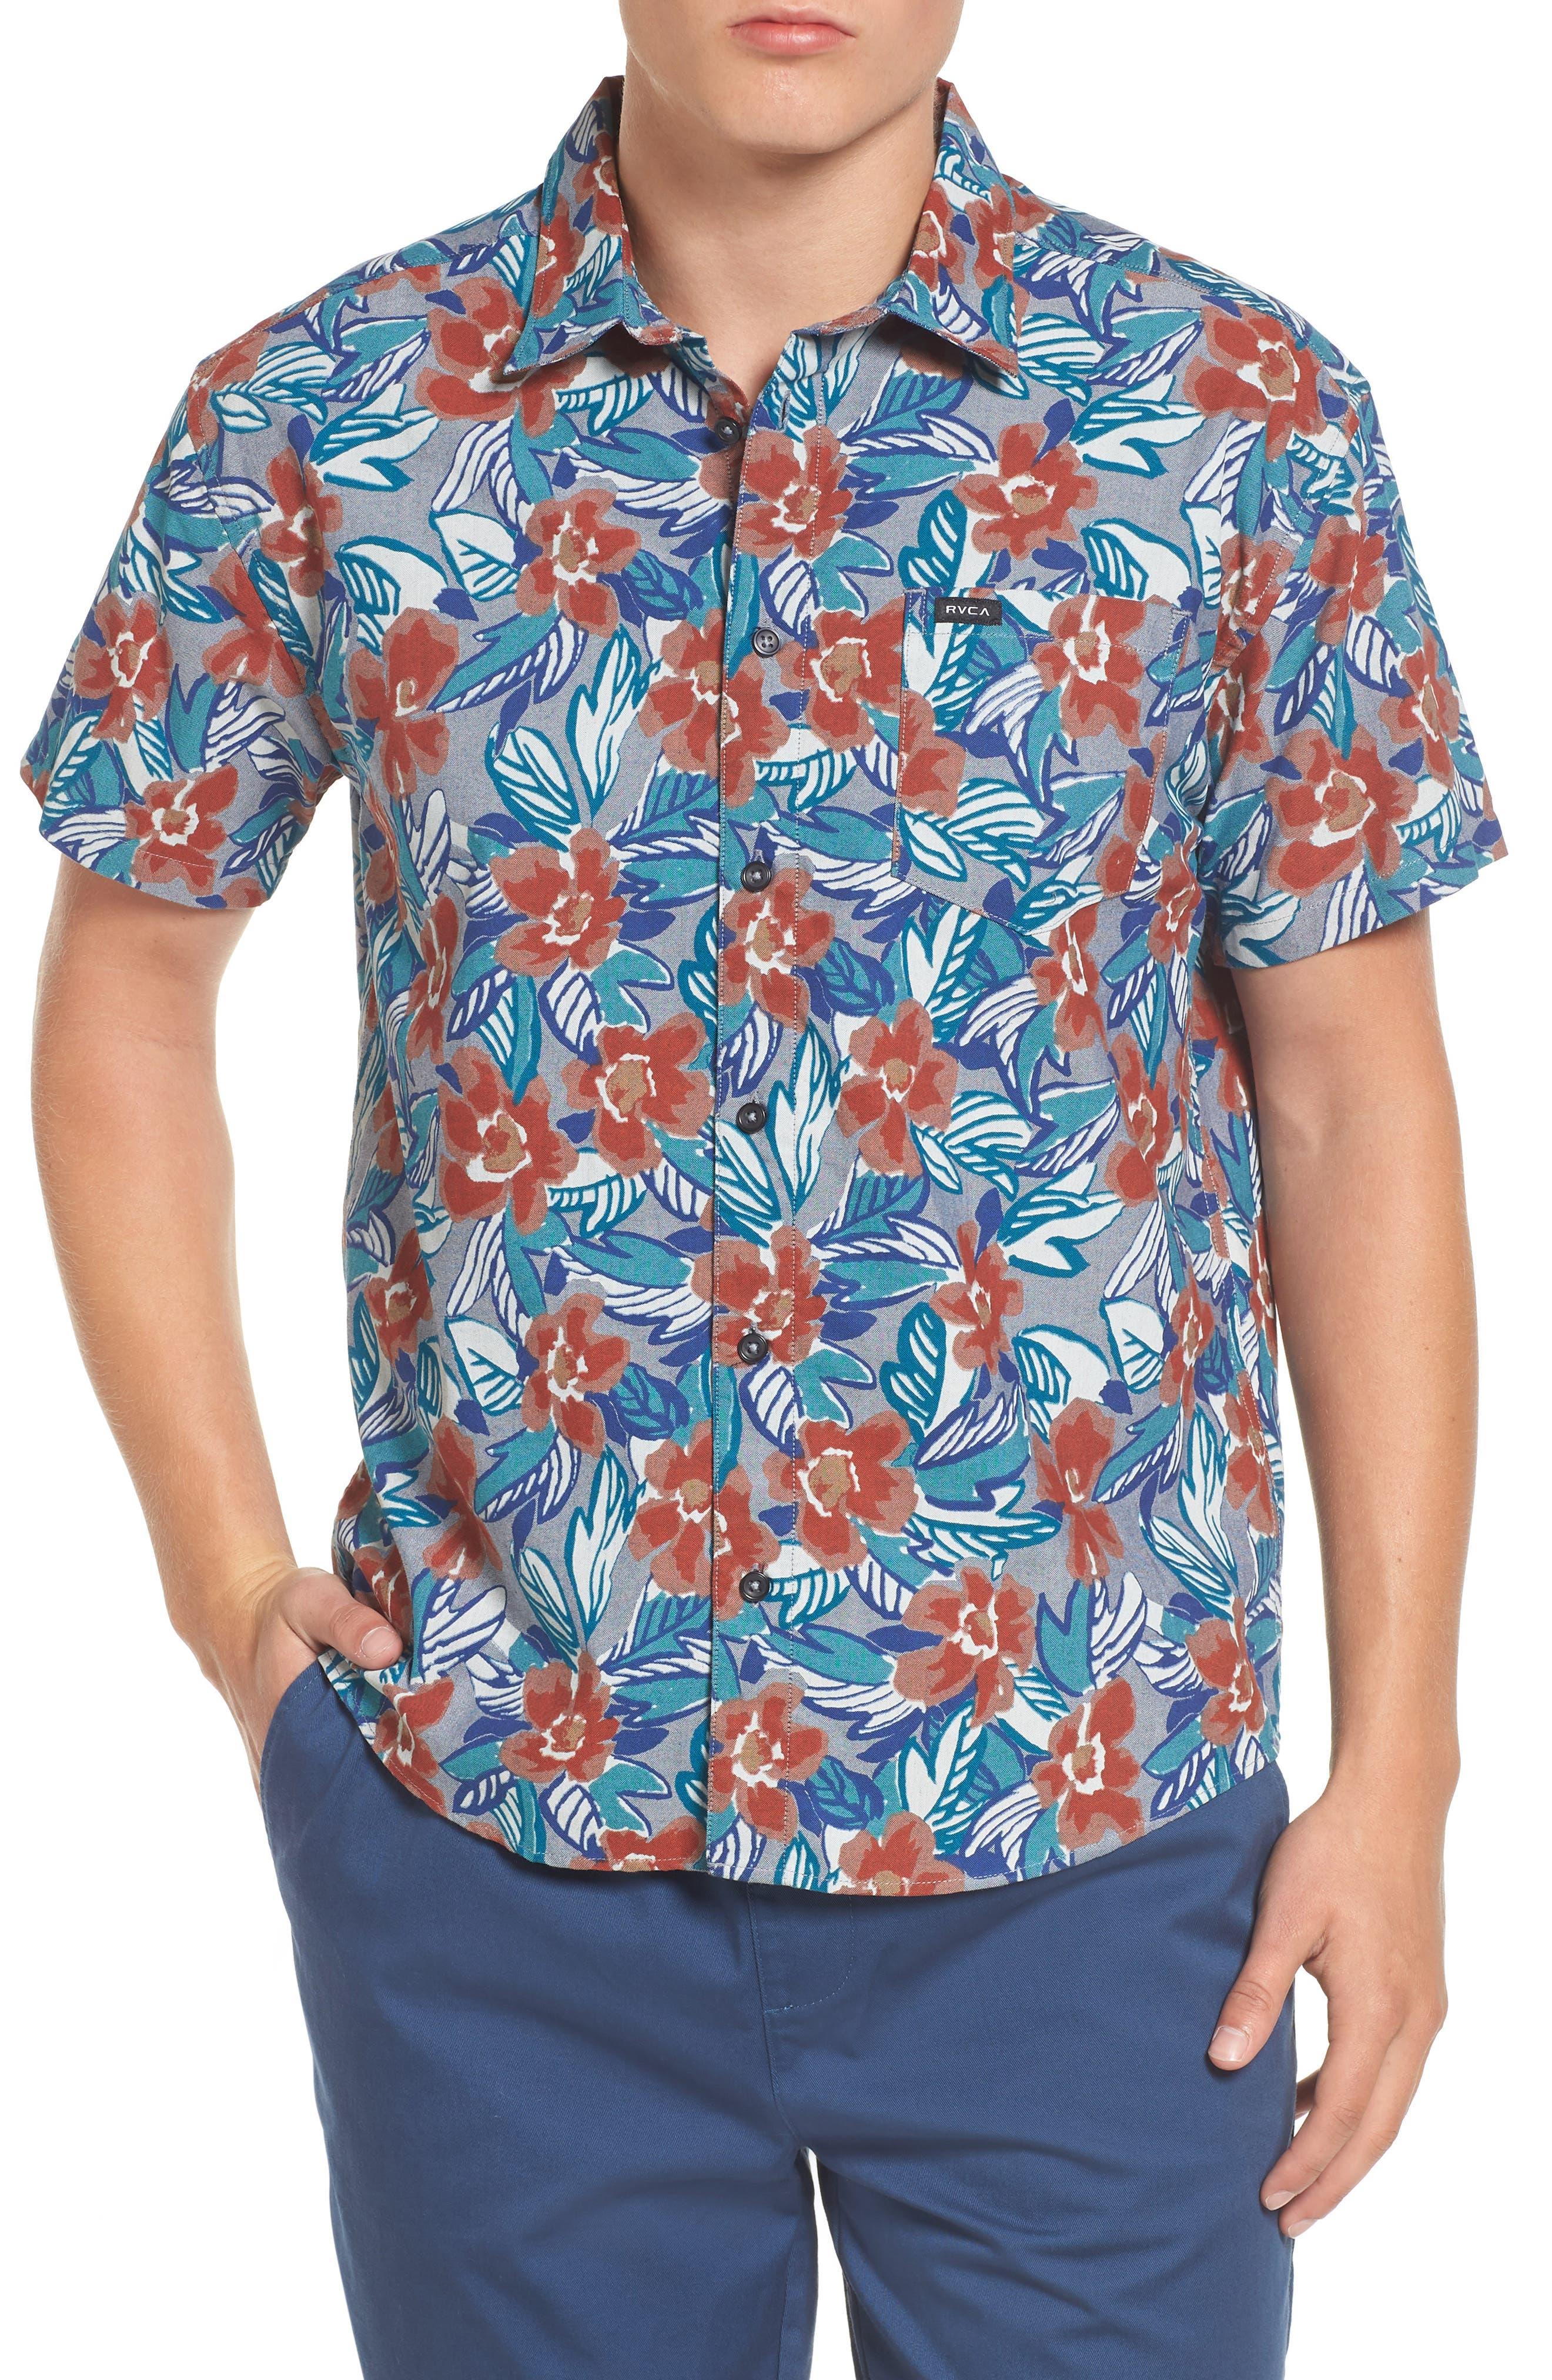 Main Image - RVCA Paradise Valley Floral Woven Shirt